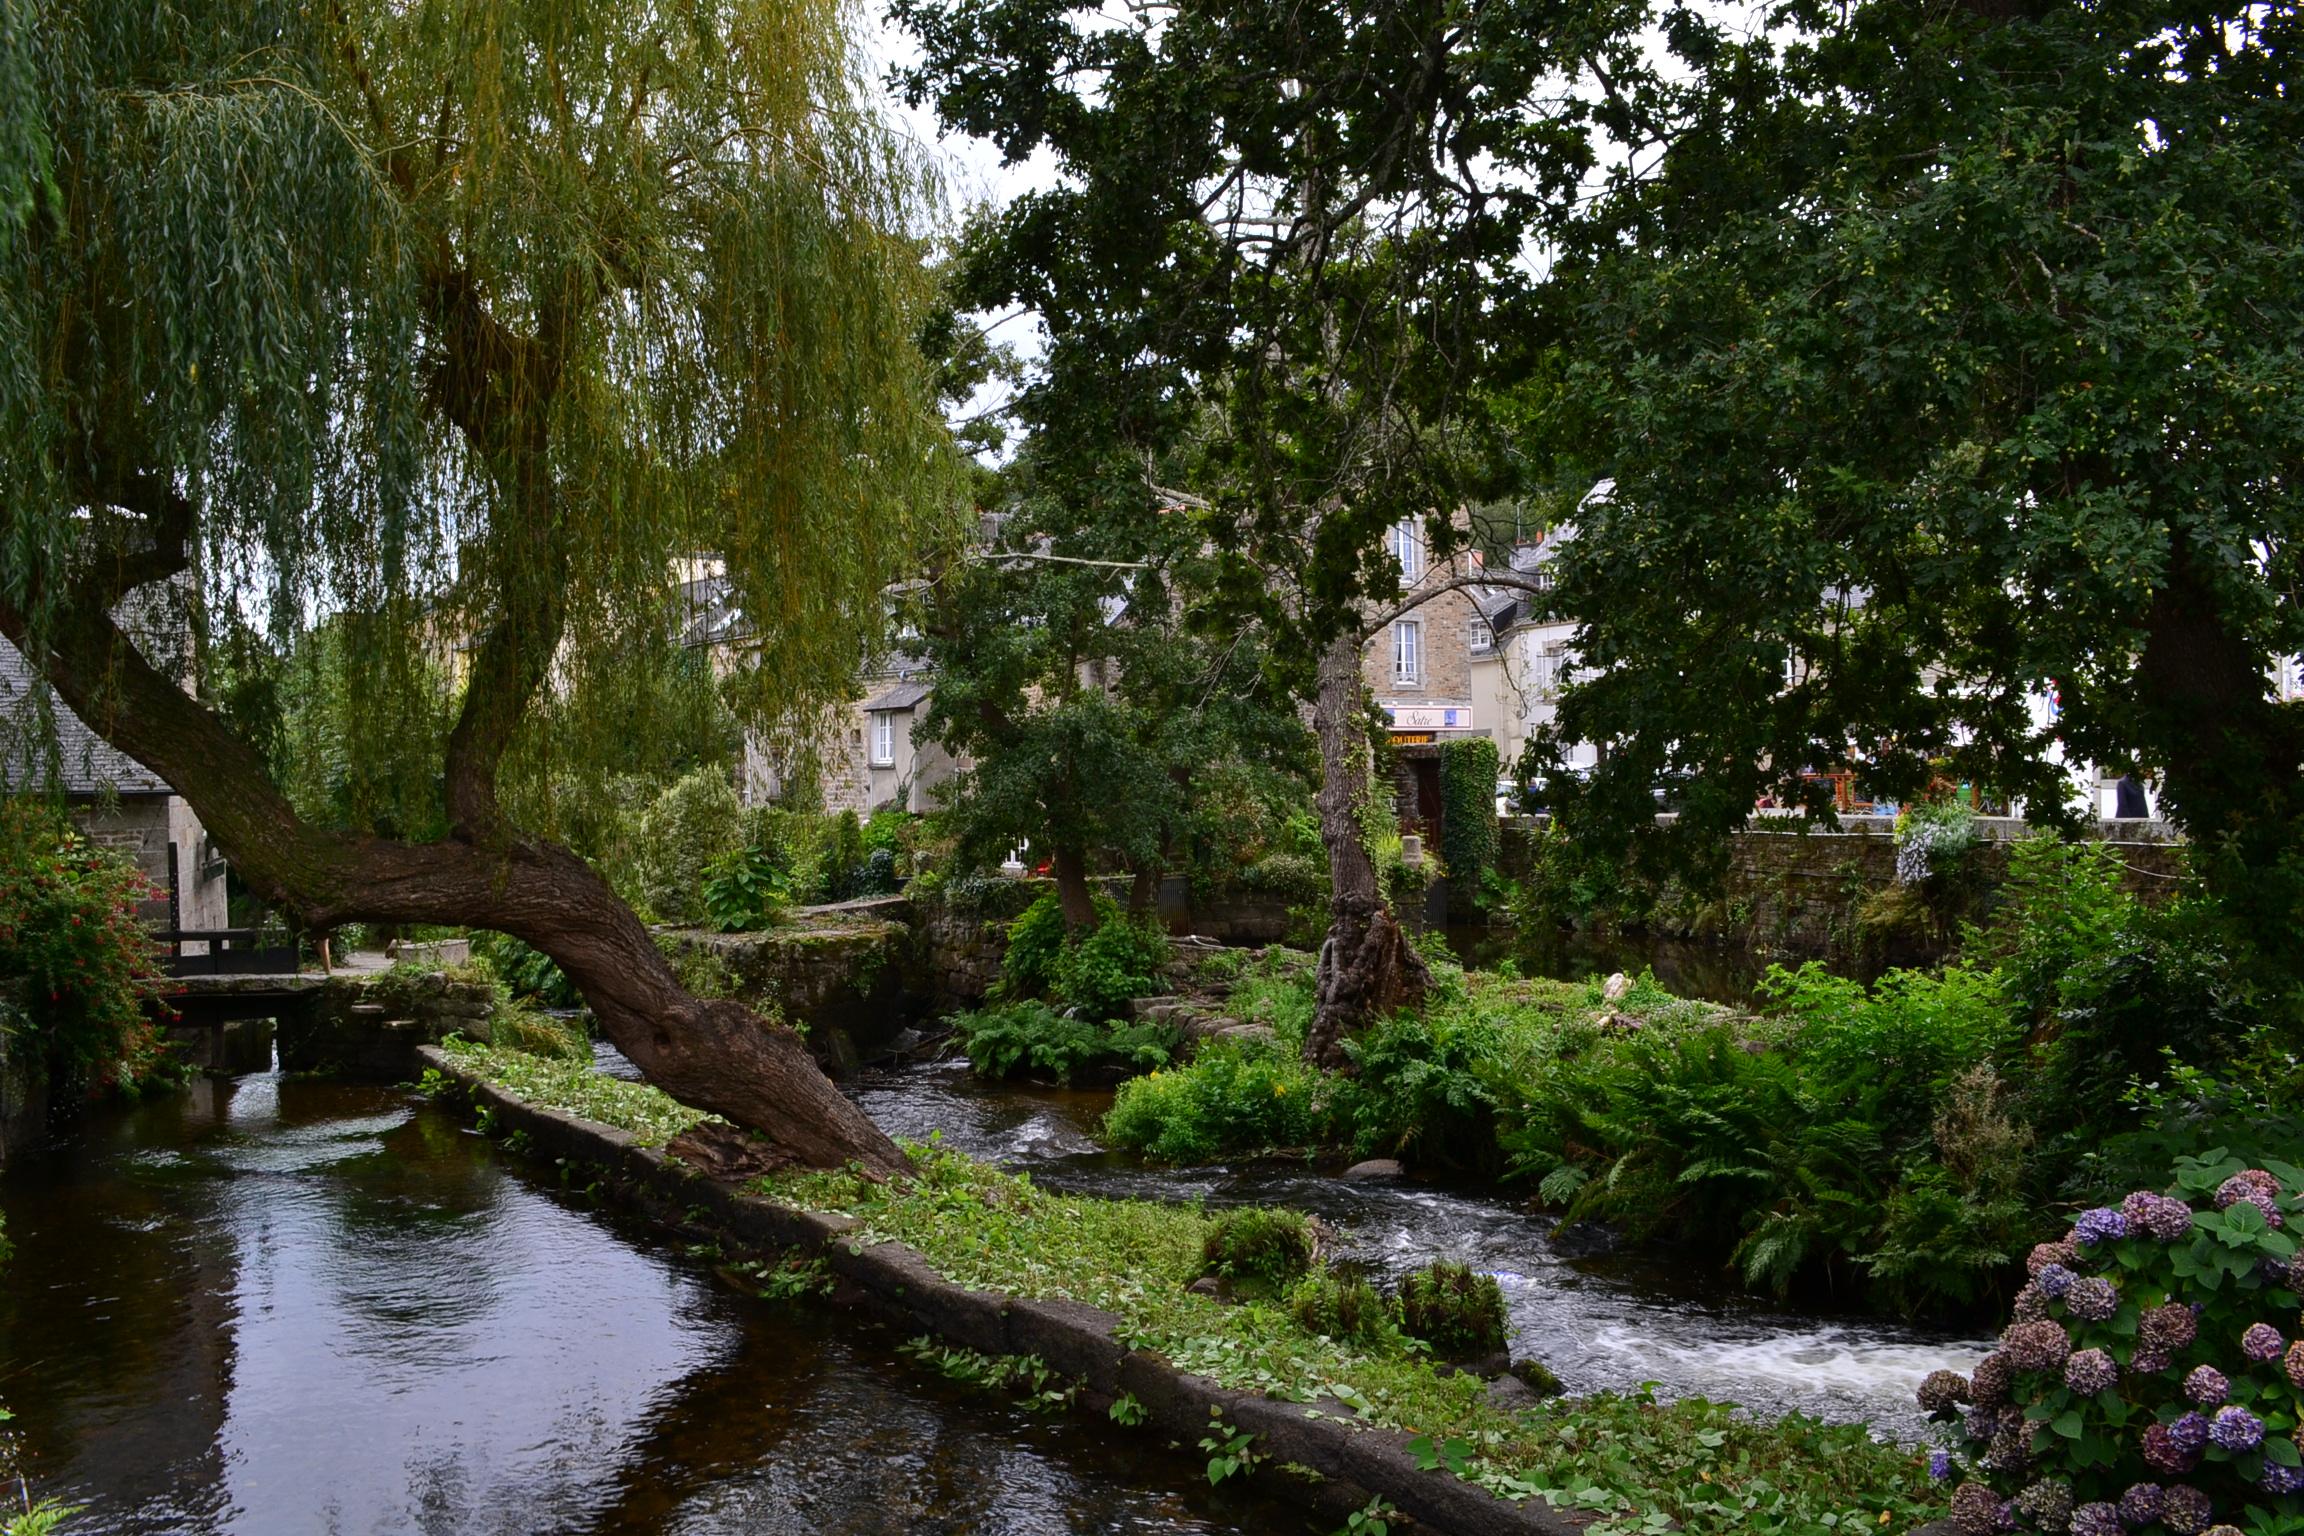 Bois d'Amour in Pont-Aven, Brittany | © Hristos Fleturis